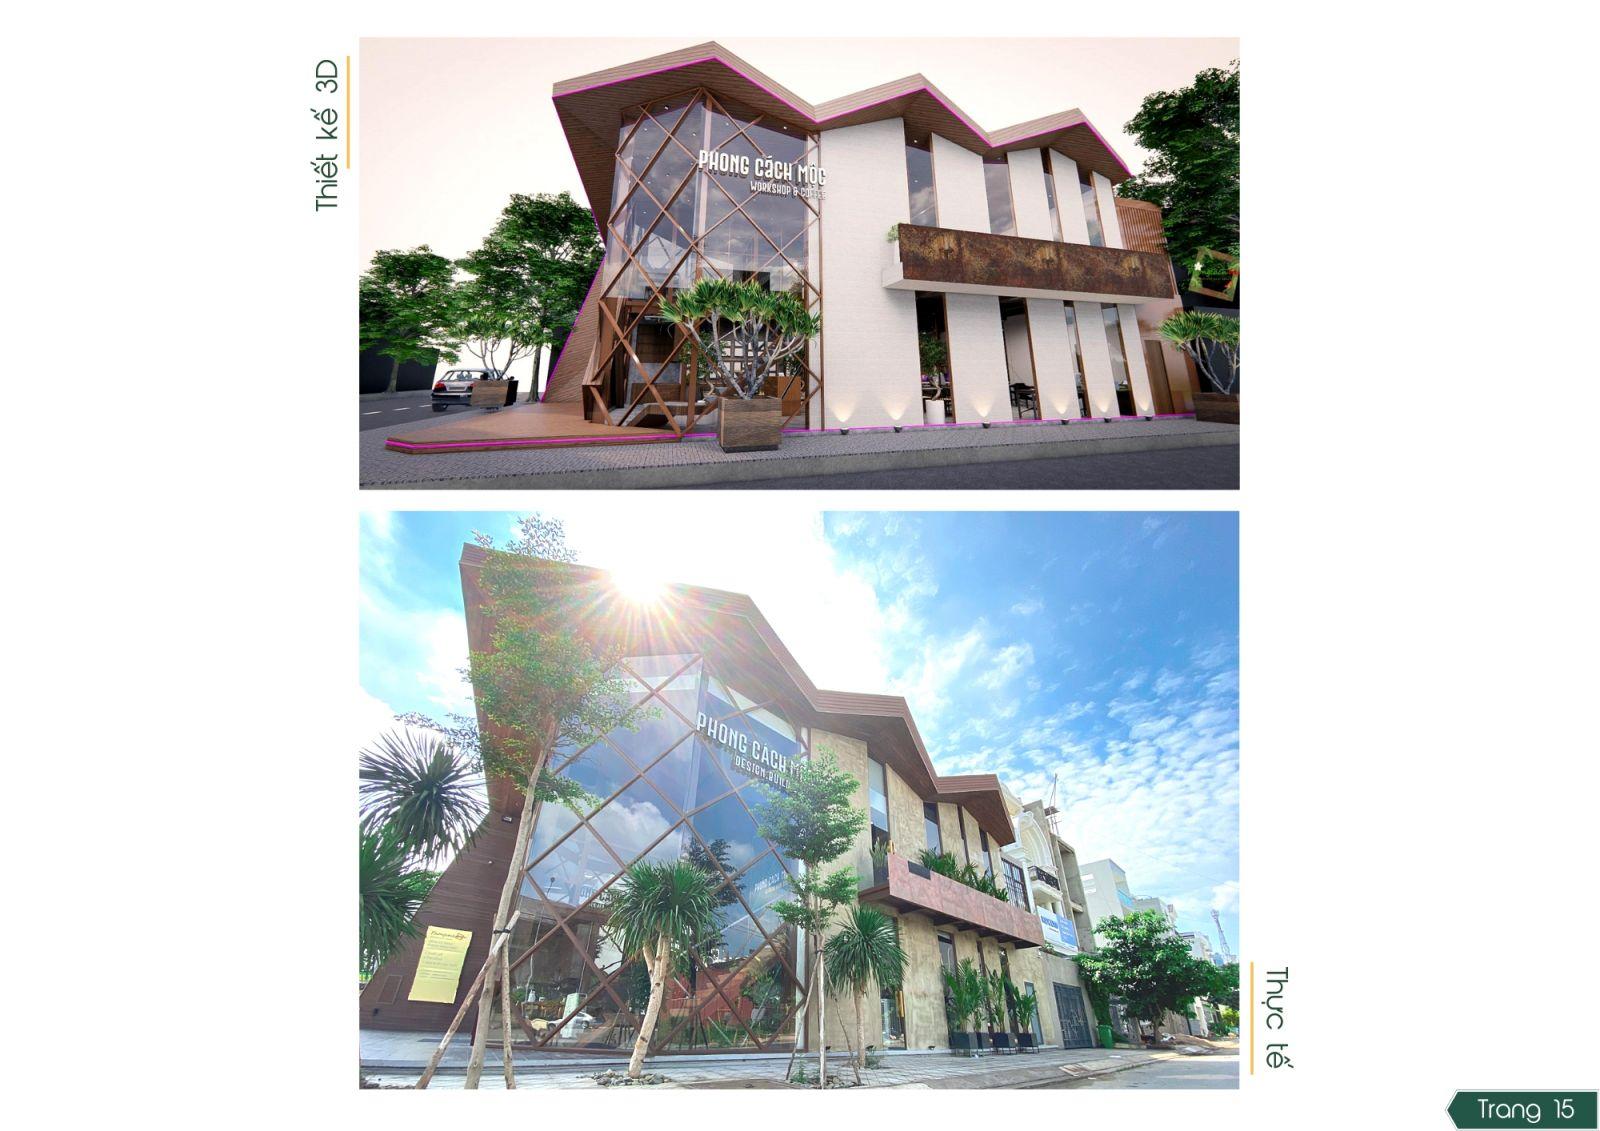 thiet-ke-thi-cong-van-phong-pcm-workshop-32